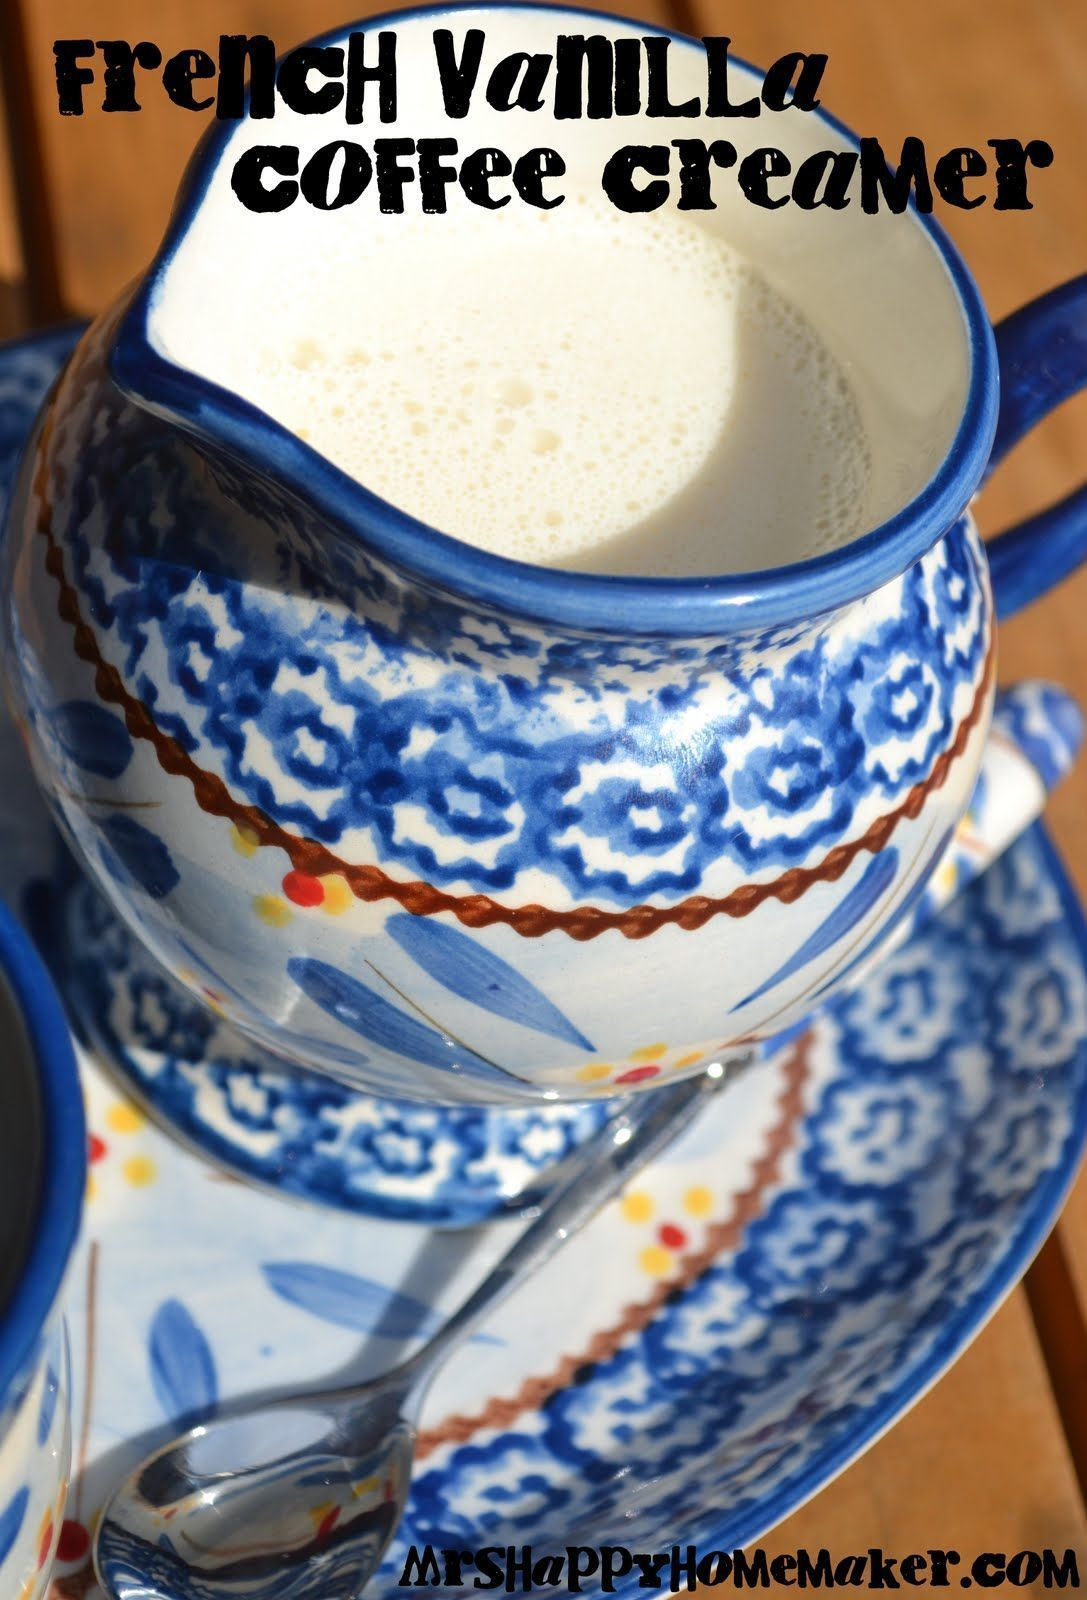 DIY French Vanilla Coffee Creamer Ingredients 14oz